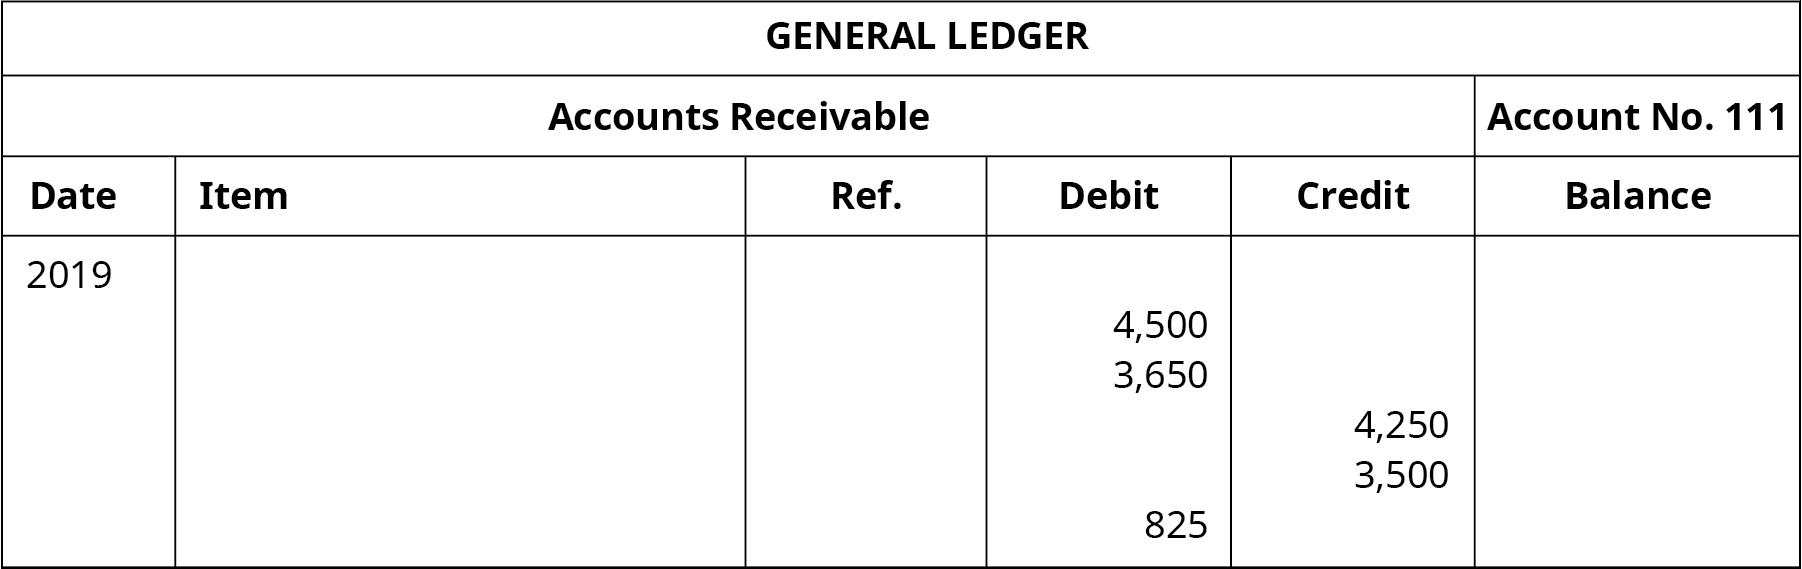 "A General Ledger titled ""Accounts Receivable No. 111"" with six columns. Date: 2019. Debt column entries: 4,500, 3,650, 825. Credit column entries: 4,250, 3,500."